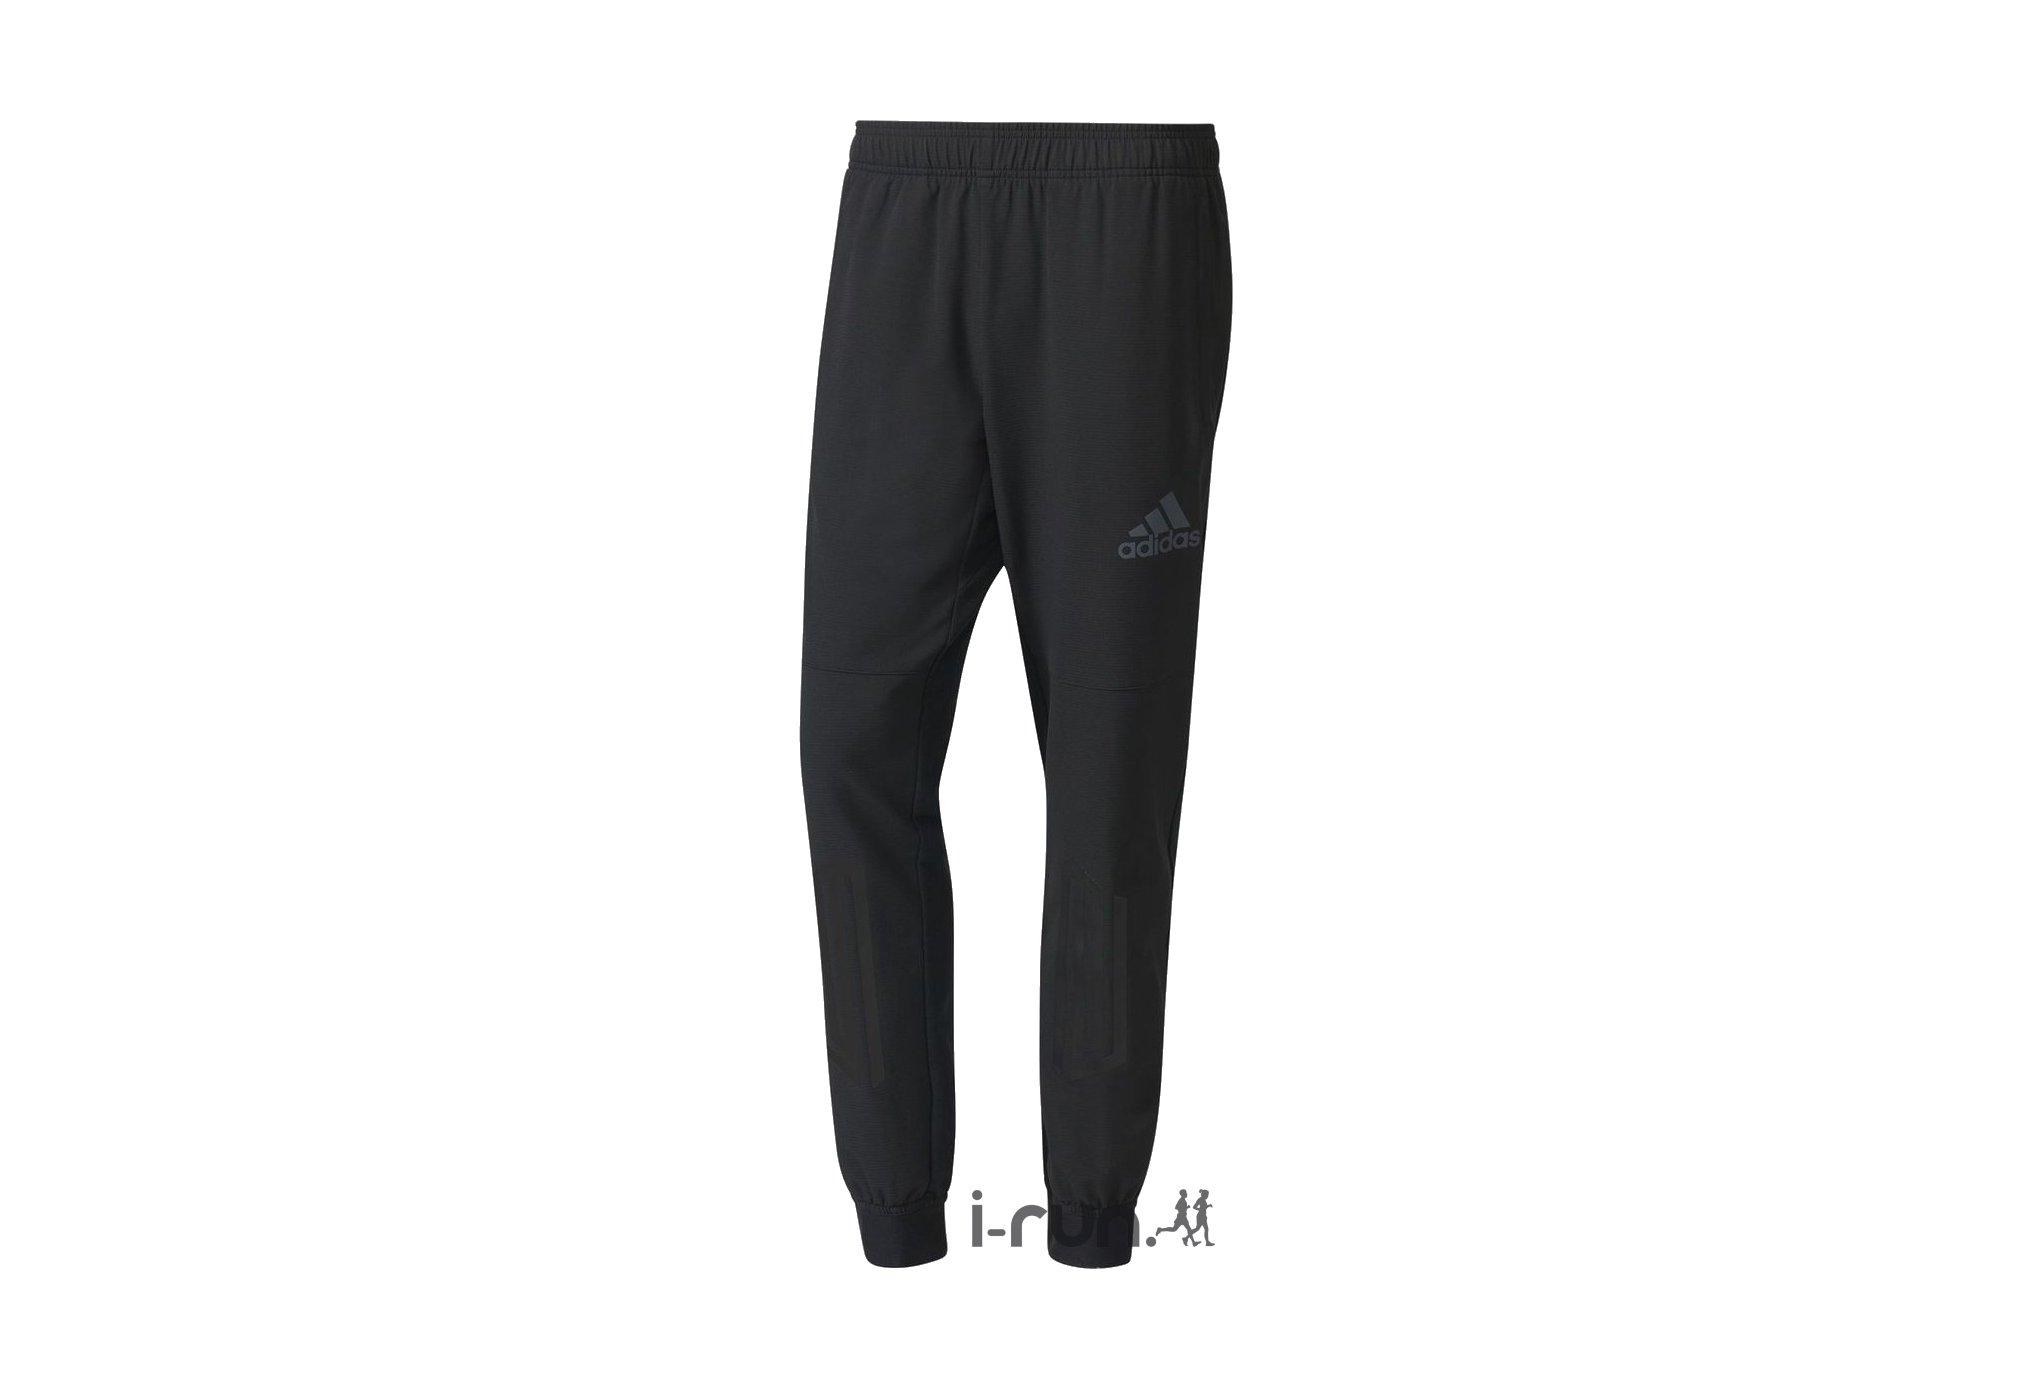 adidas Extreme Workout M vêtement running homme